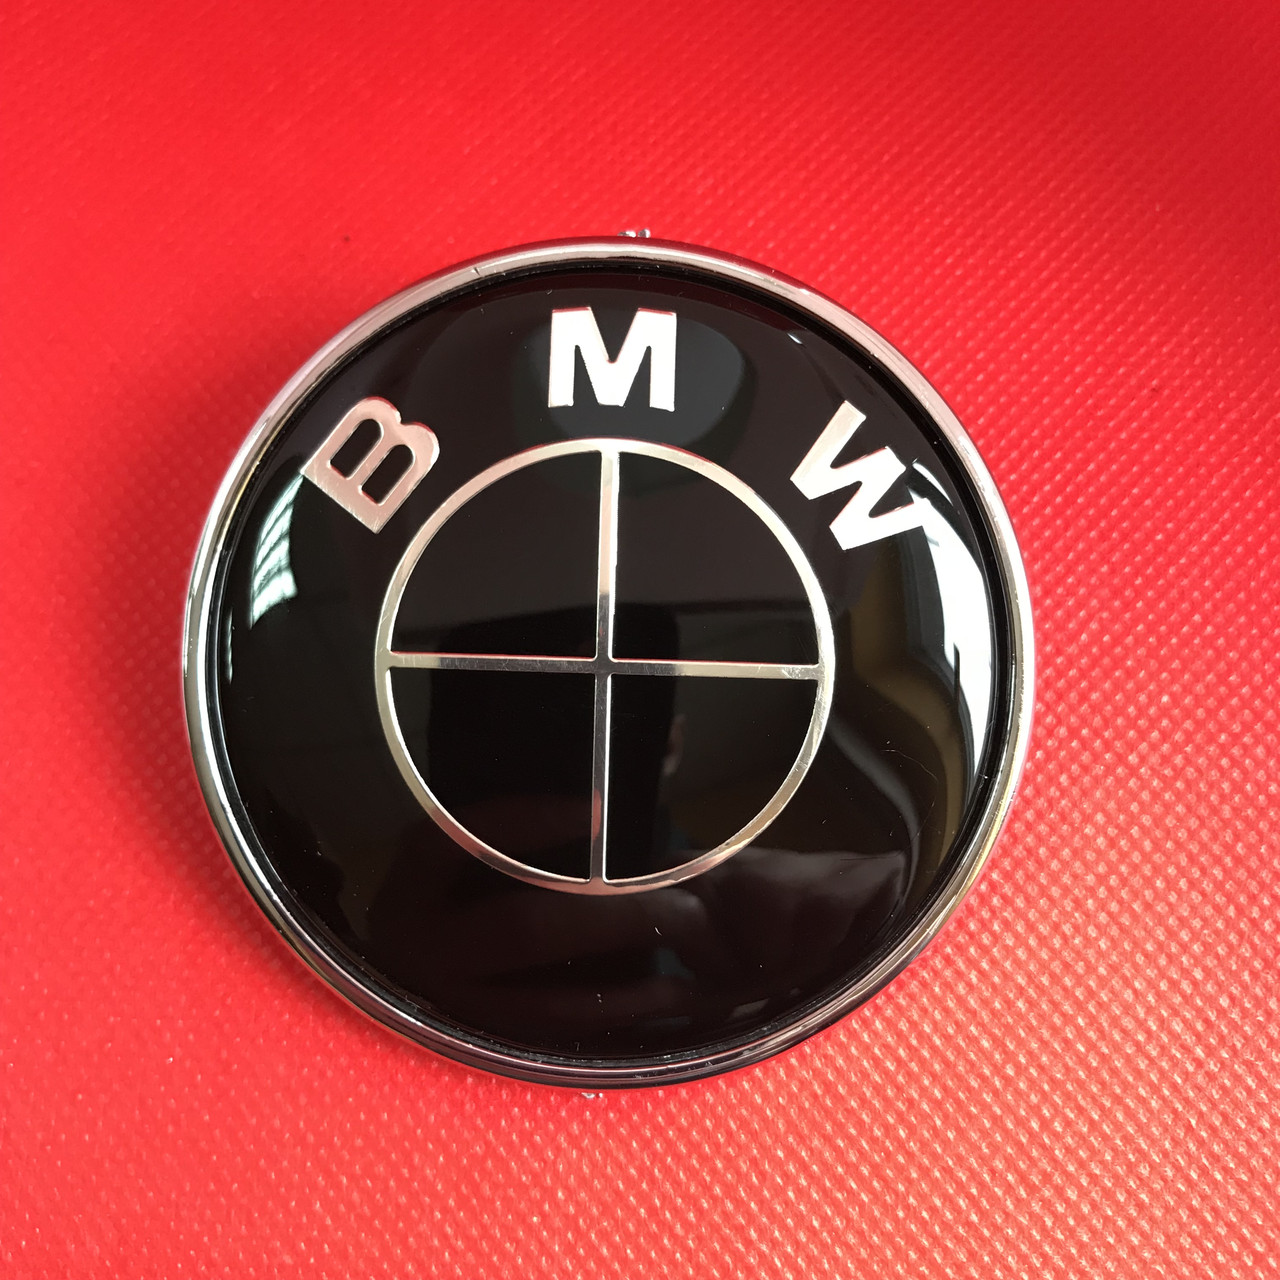 Эмблема логотип BMW   БМВ М 82 мм на капот багажник чёрная